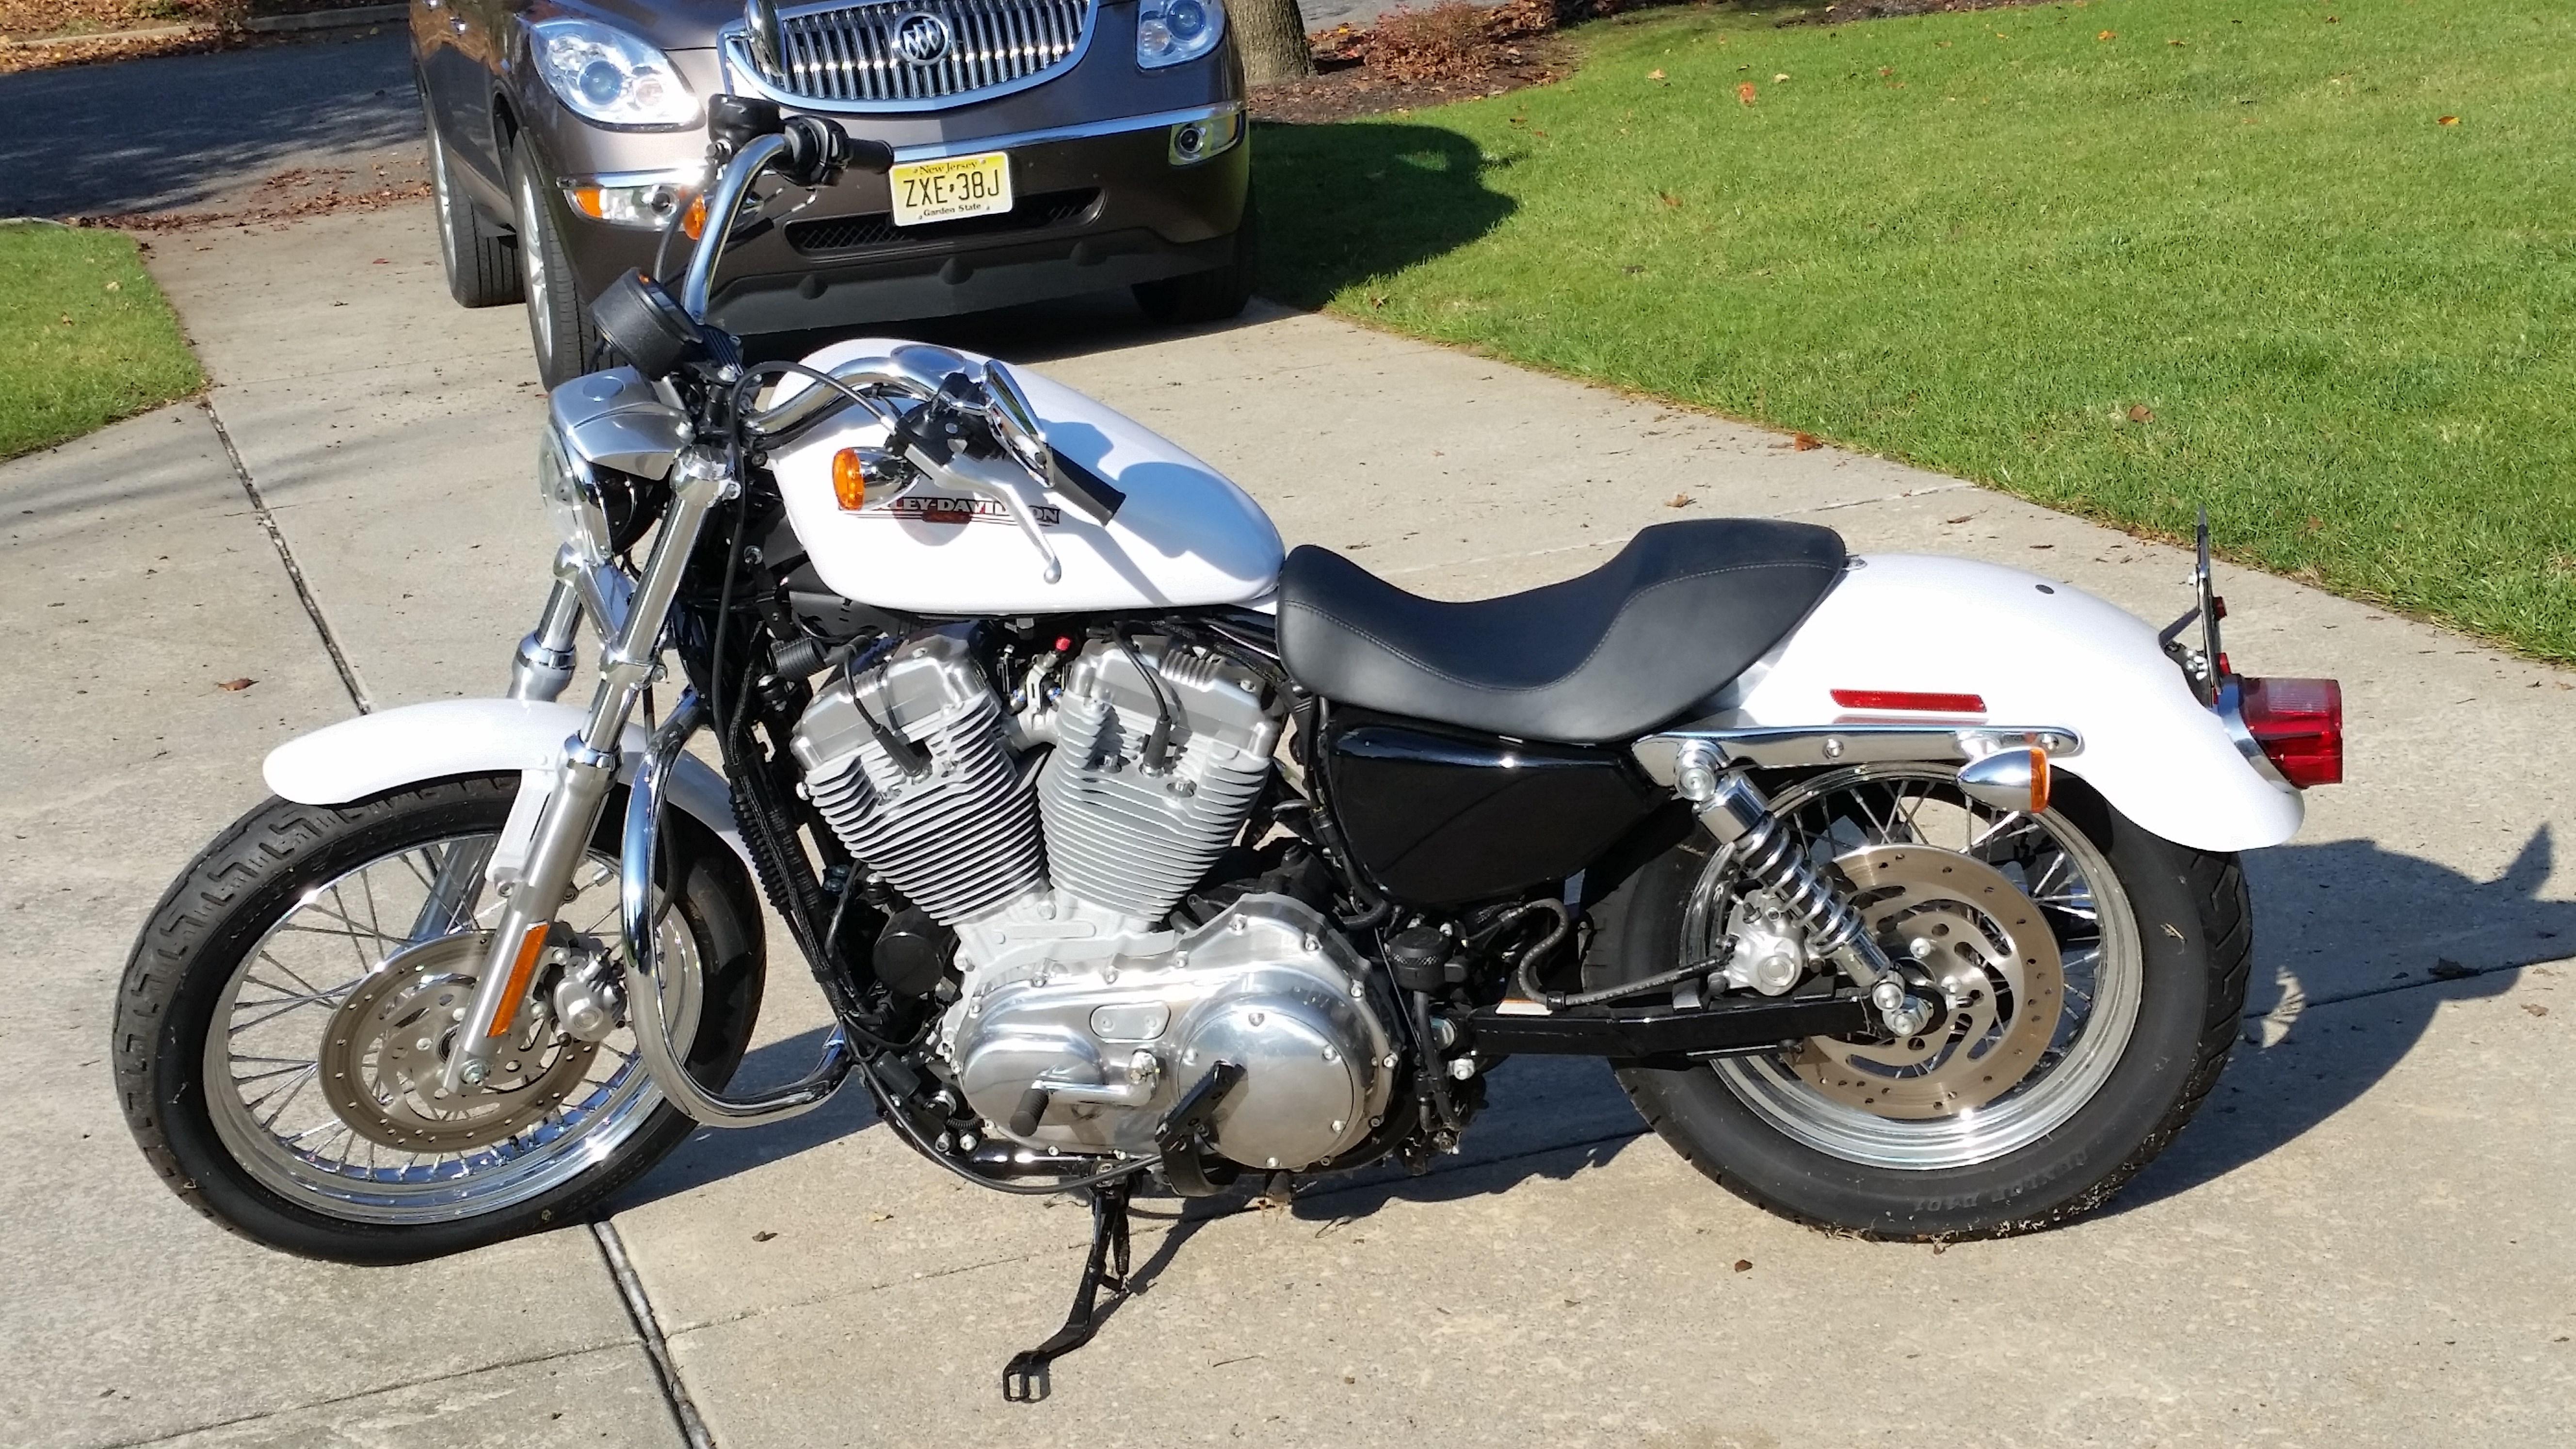 2017 Harley Dealer Washington >> All New & Used Harley-Davidson® Sportster 883 (1,228 Bikes, Page 1) | ChopperExchange